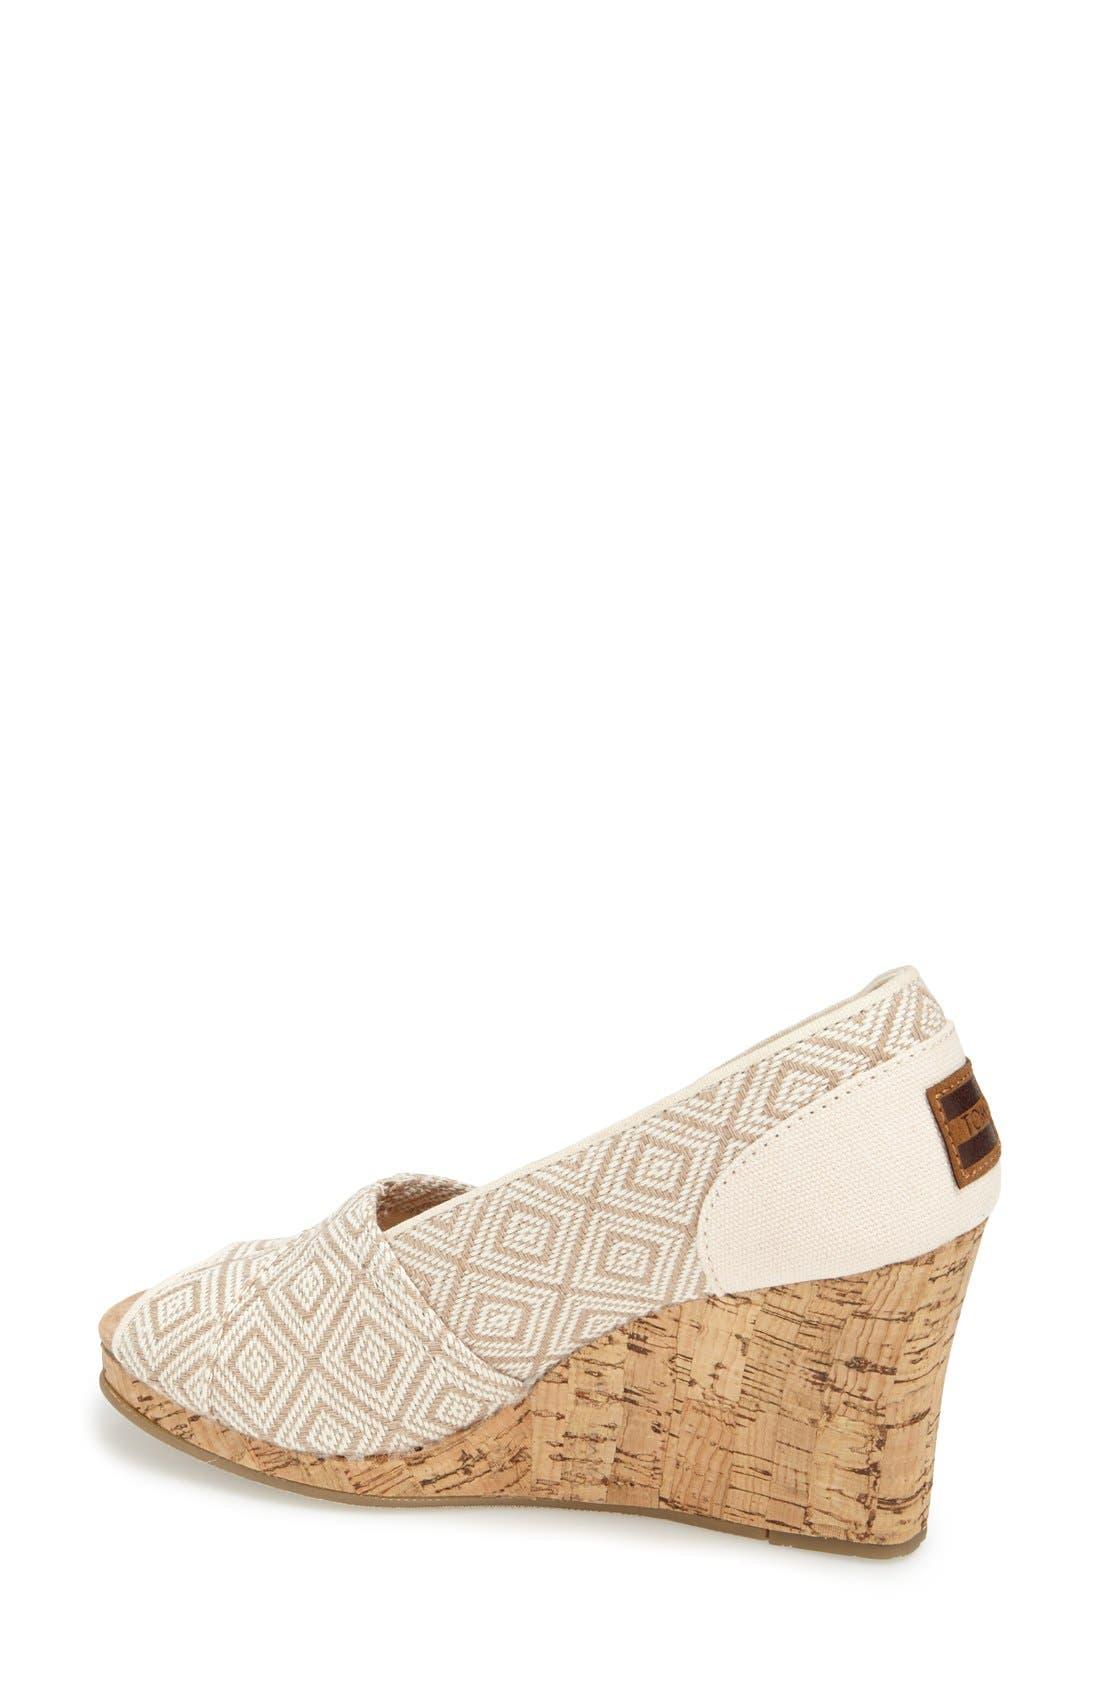 Alternate Image 2  - TOMS 'Classic' Woven Wedge Sandal (Women)